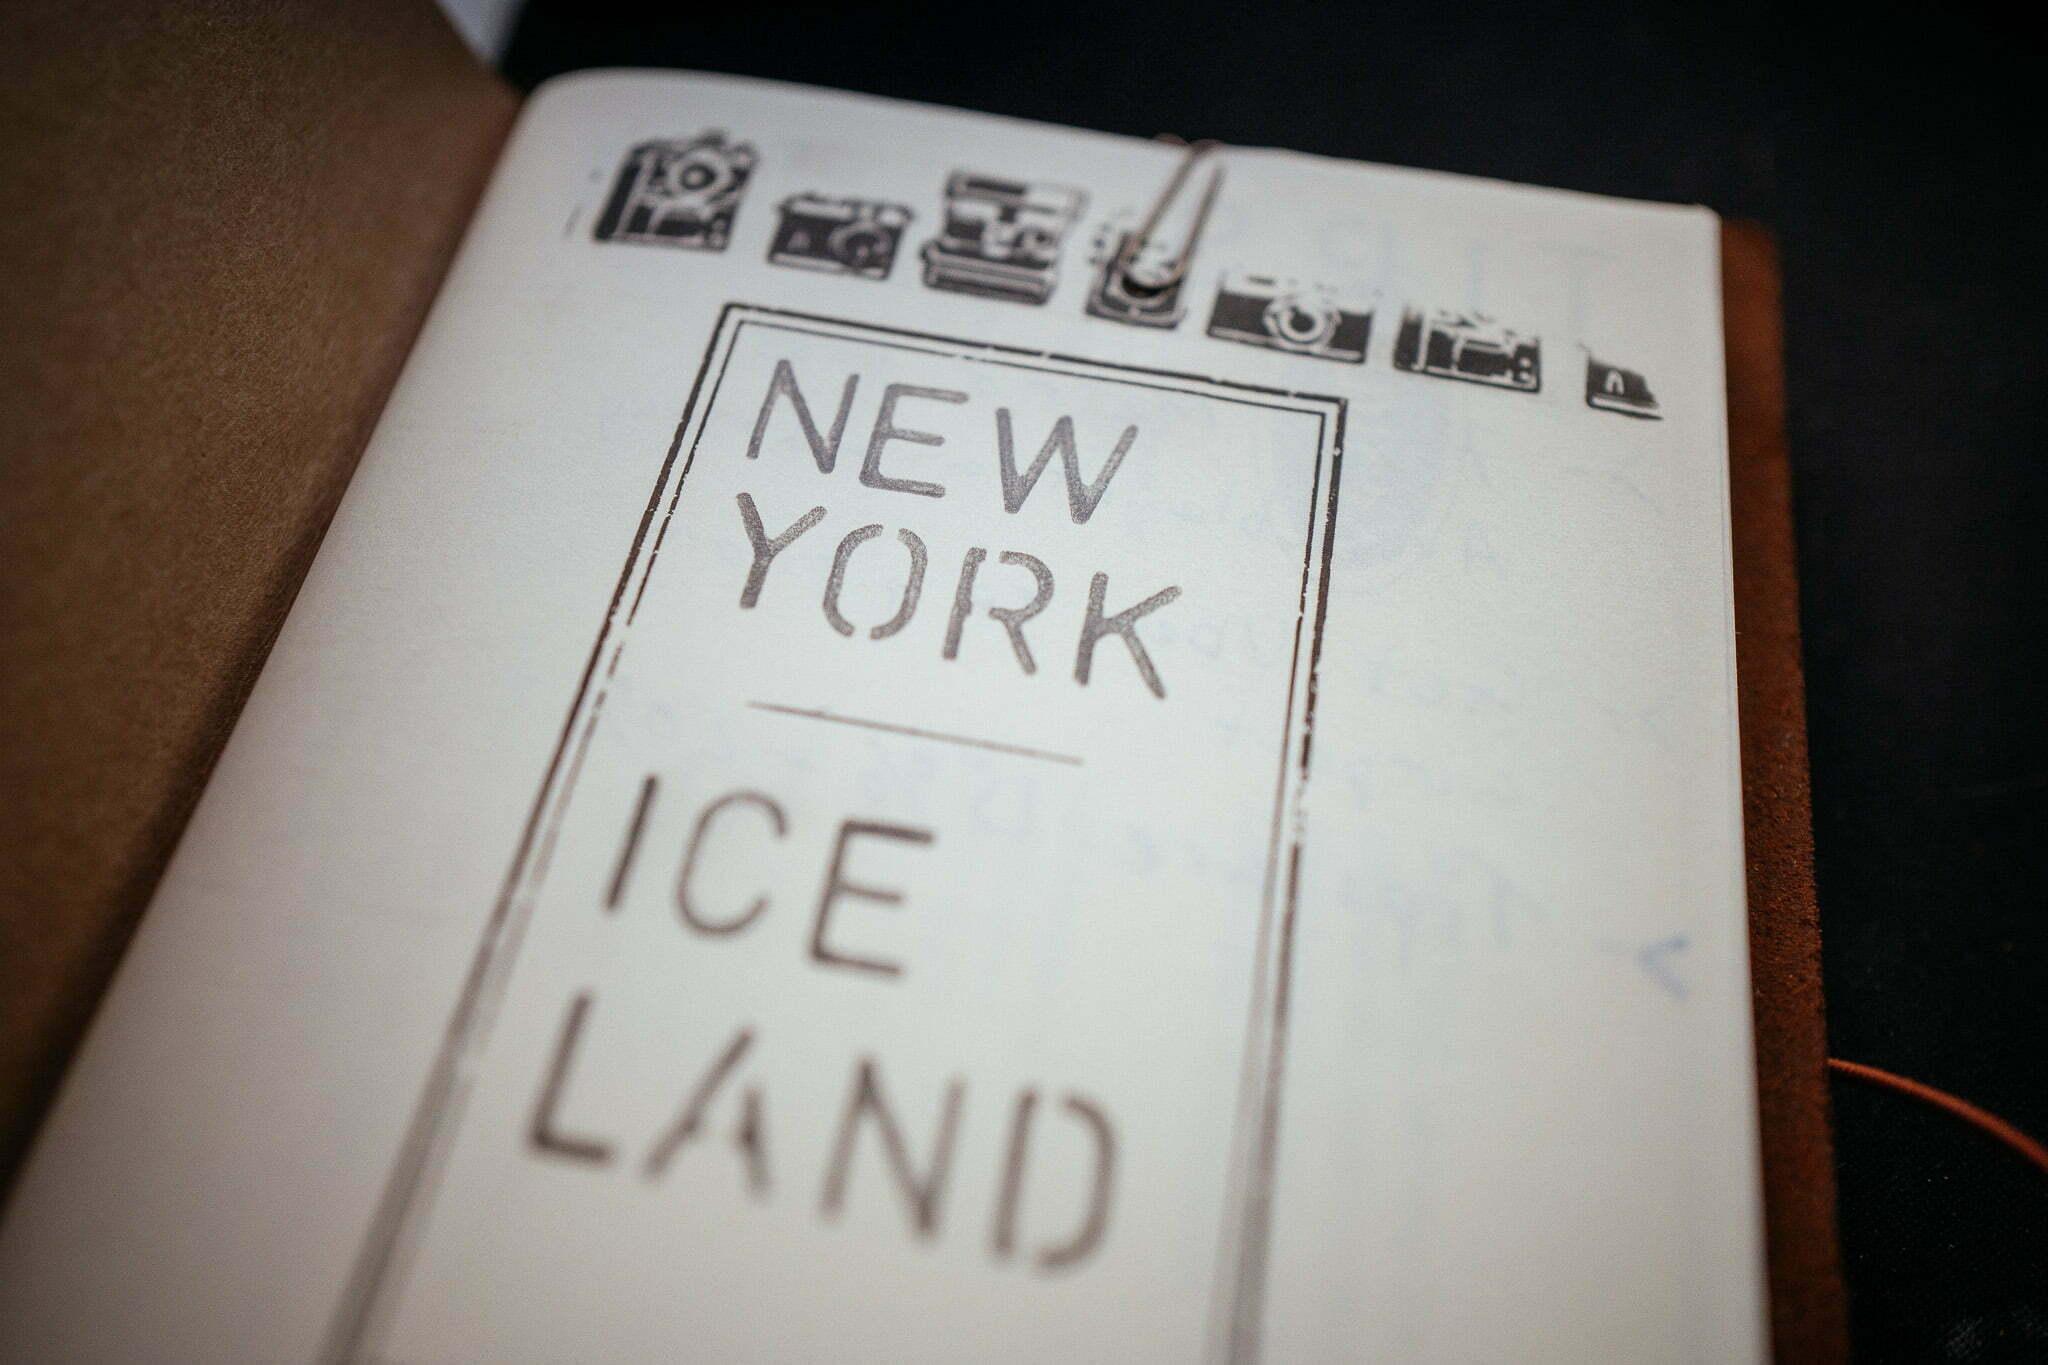 My New York Journal